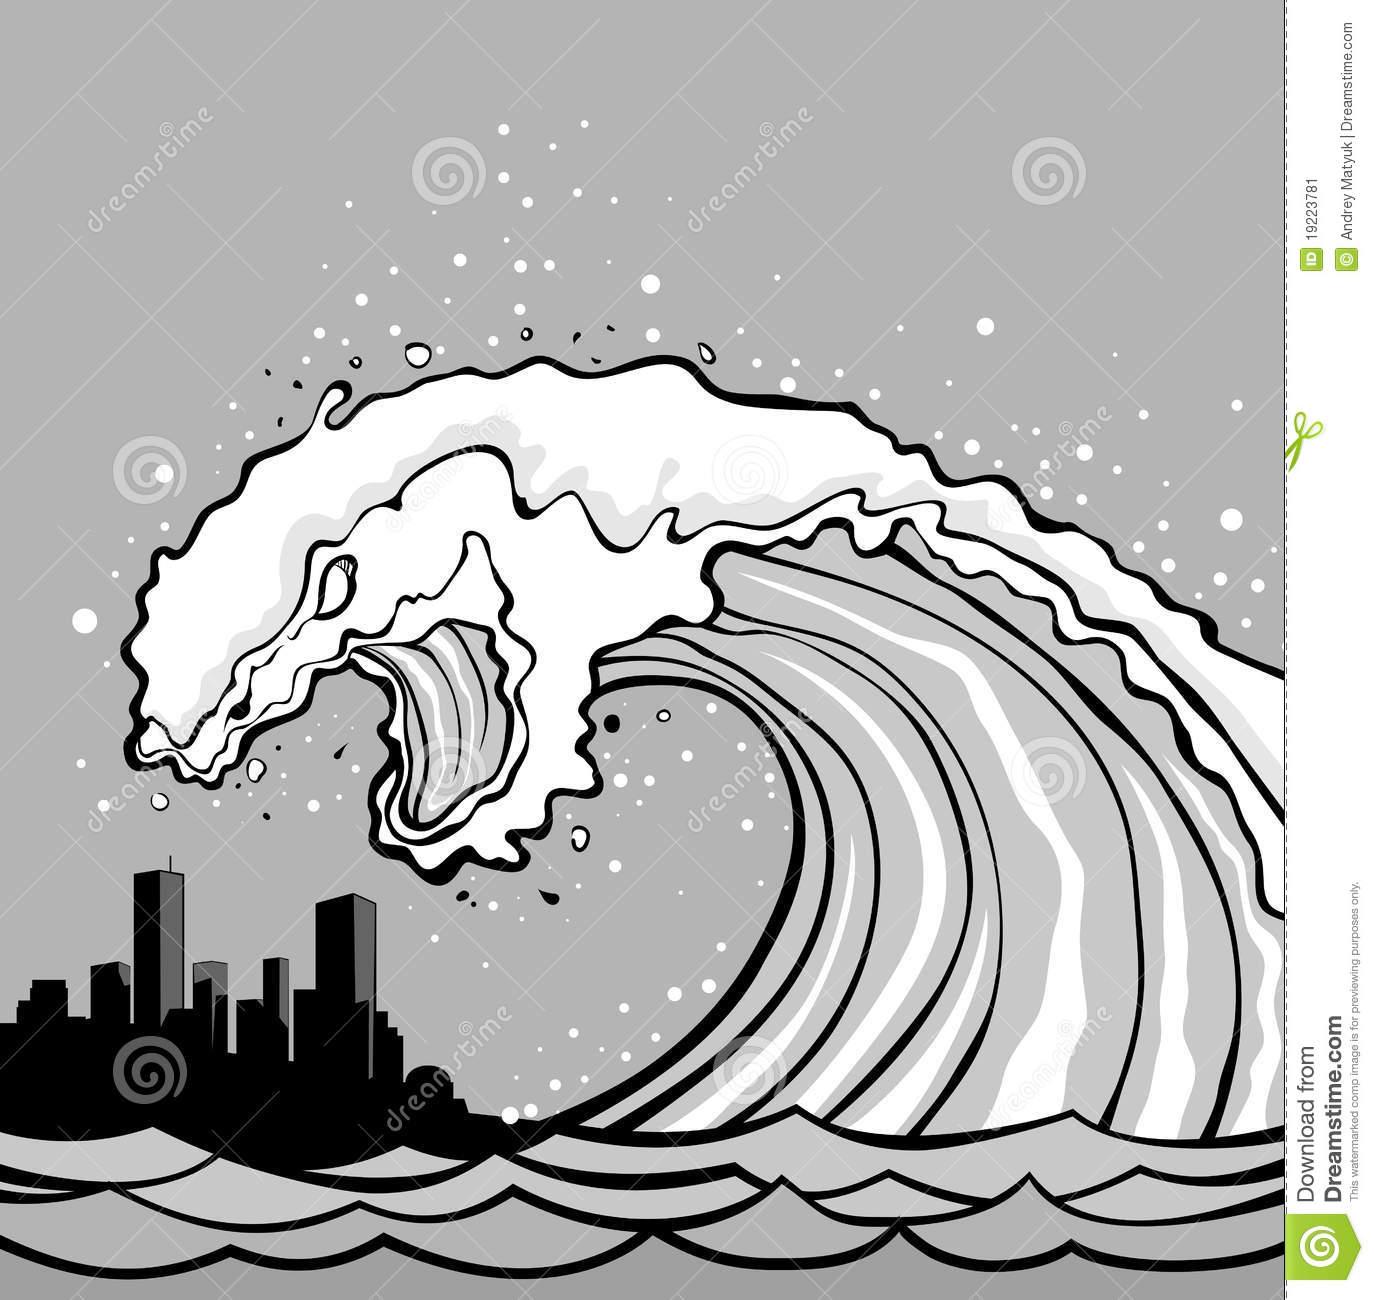 Tsunami Clip Art Free | Clipart Panda - Free Clipart Images